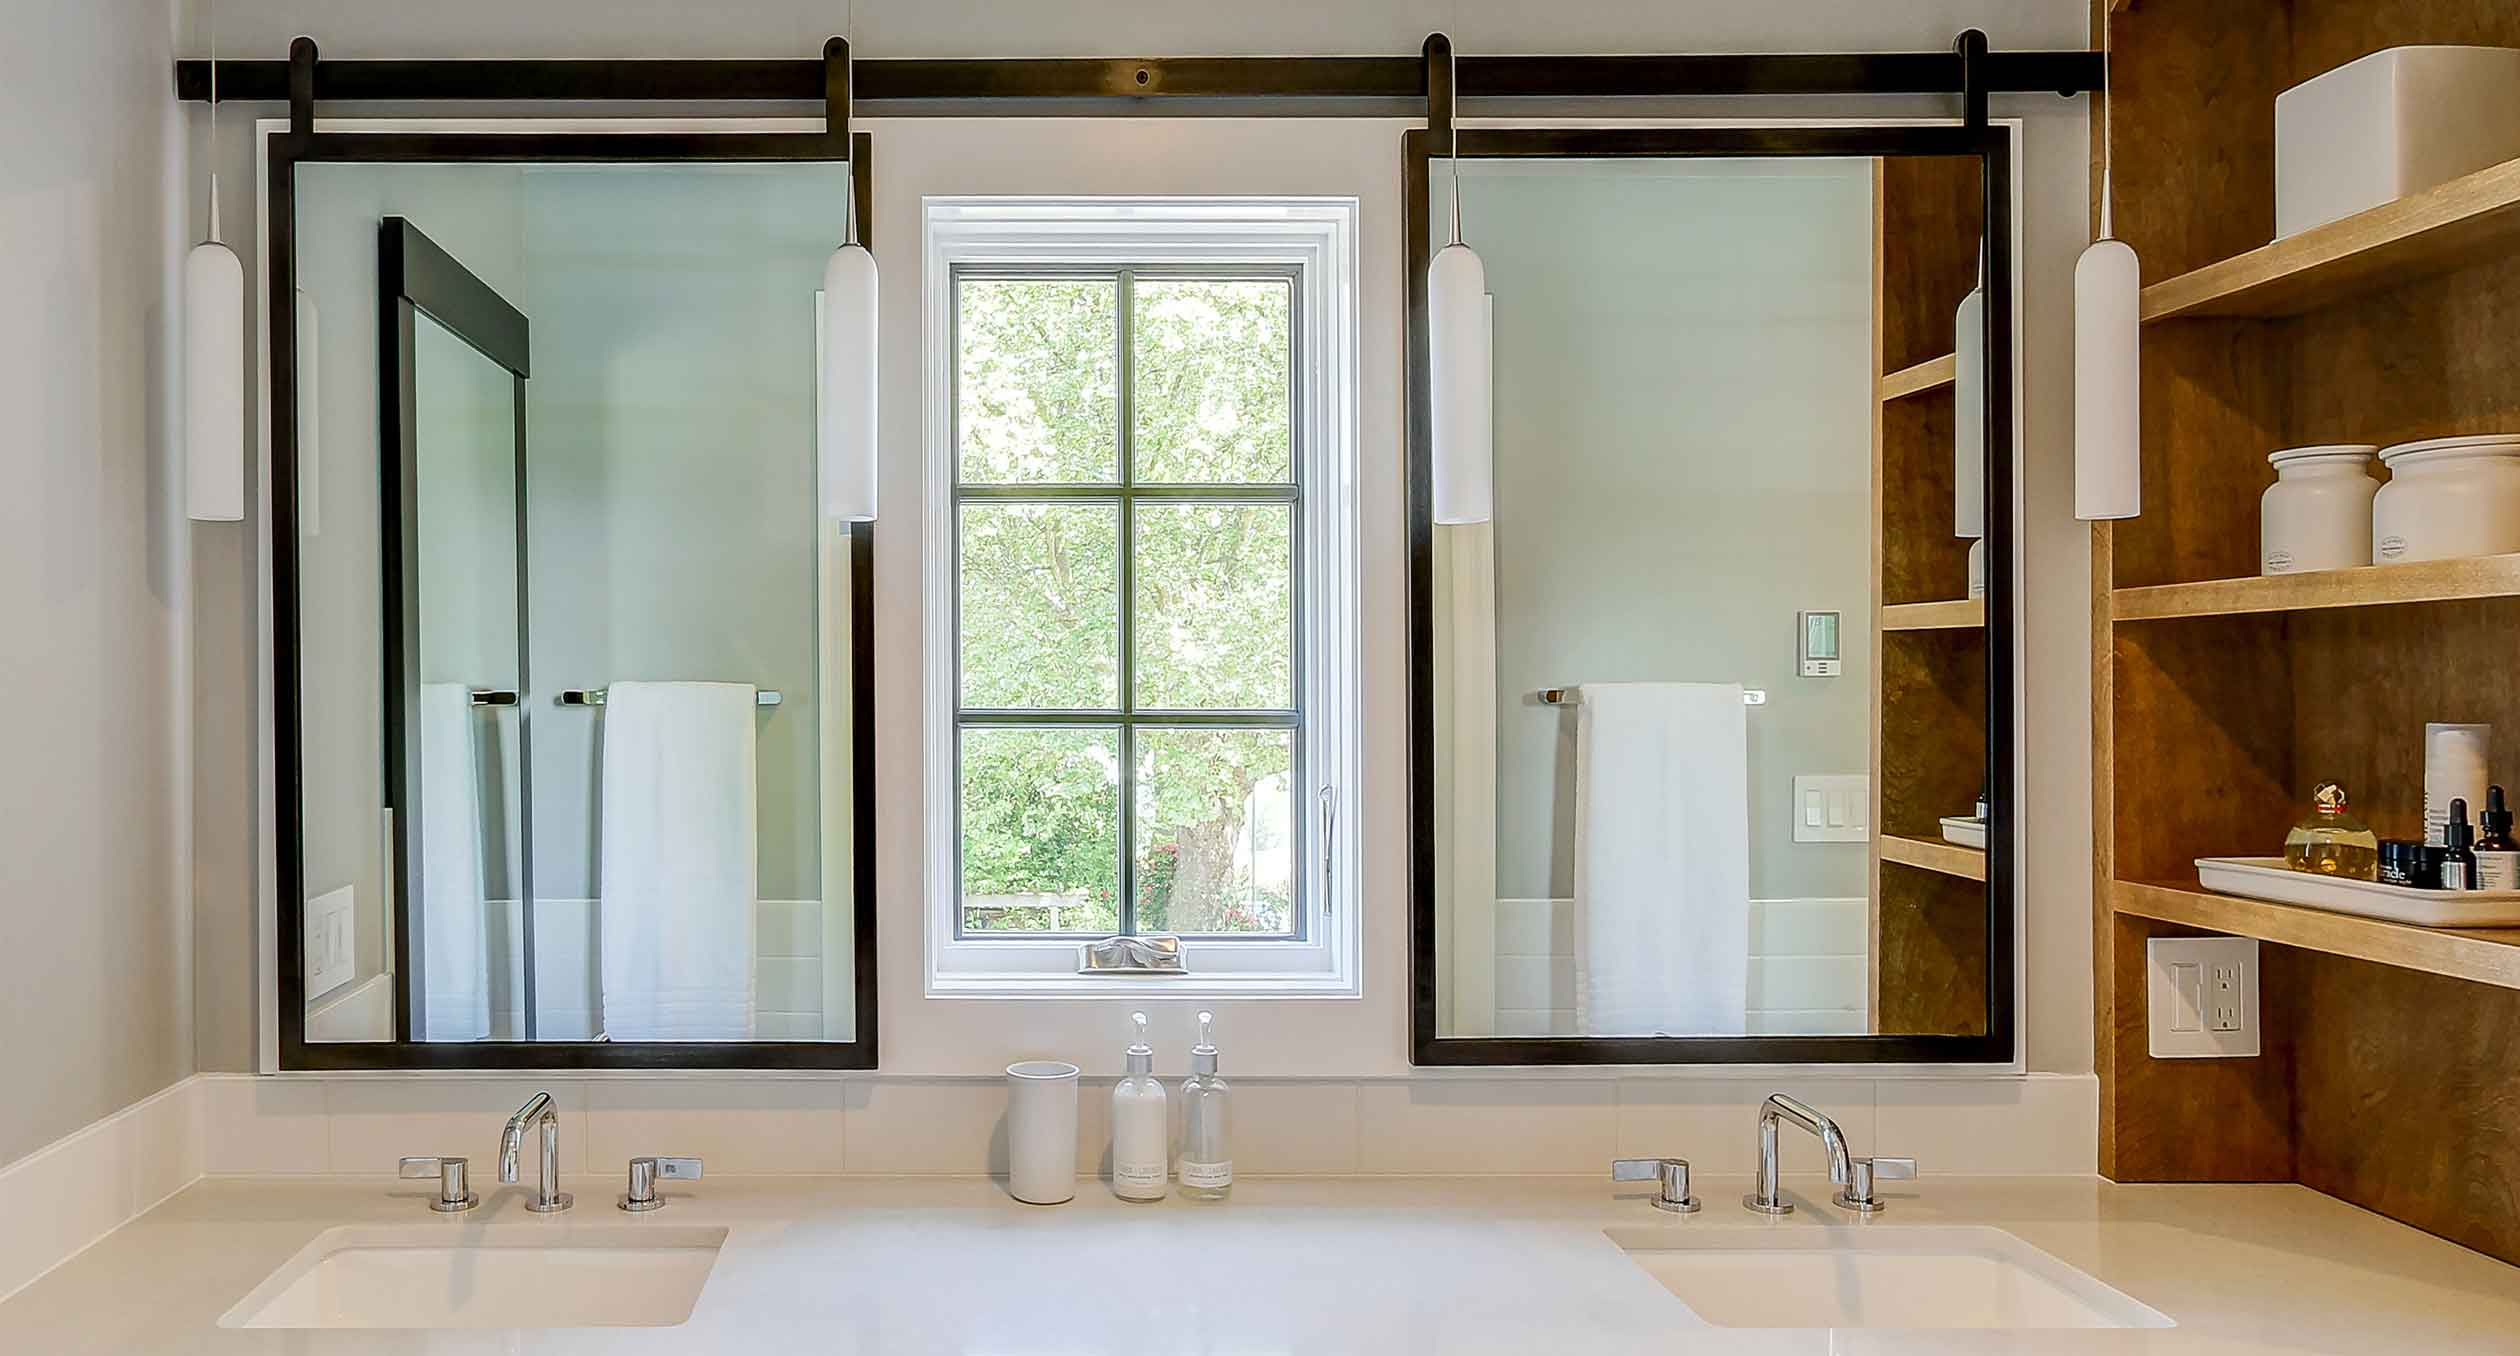 درب-و-پنجره-یو-پی-وی-سی-سرویس-بهداشتی-آماج-صنعت-آذر